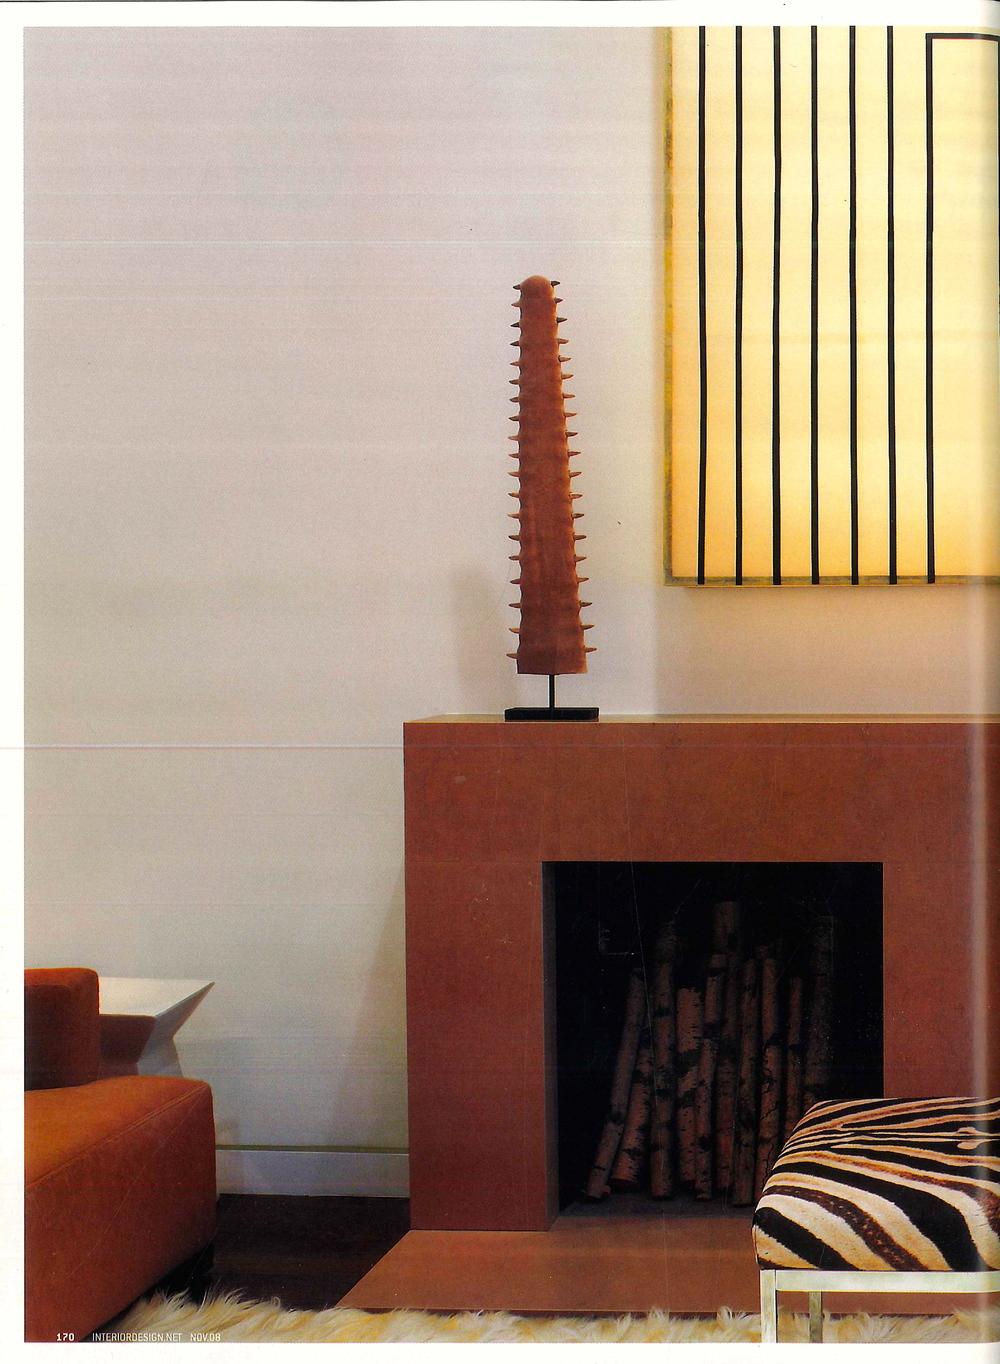 Interior Design Magazine_Nov 2008-1.jpg